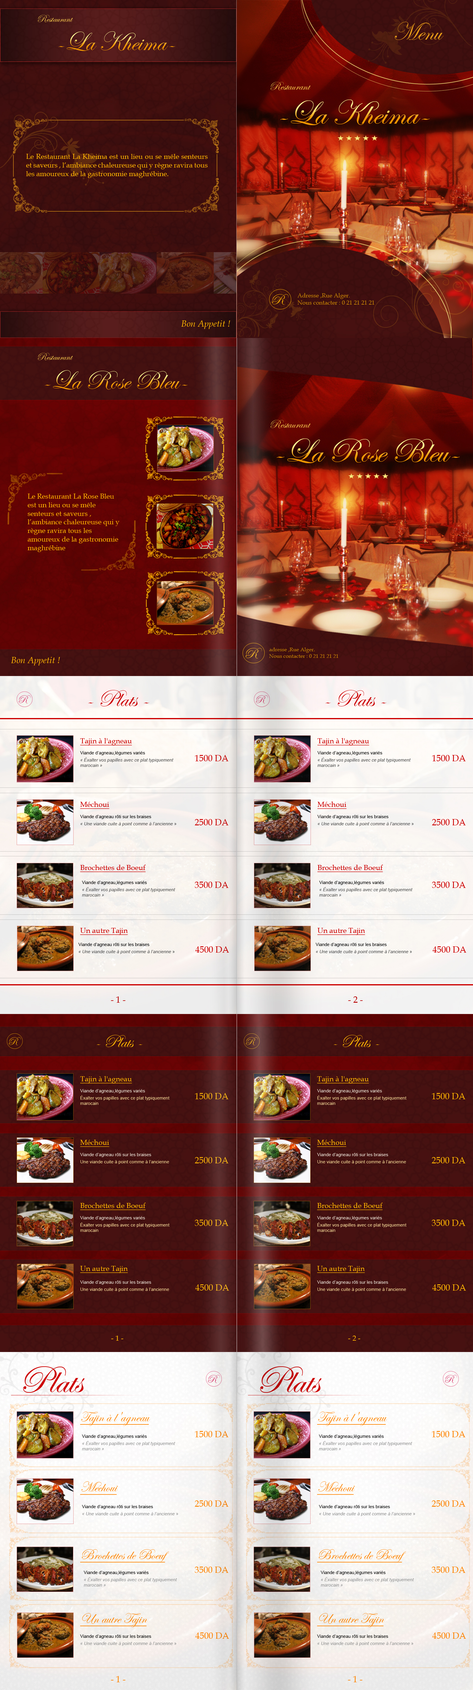 Restaurant menu design by yacine29 on deviantart for Artistic cuisine menu